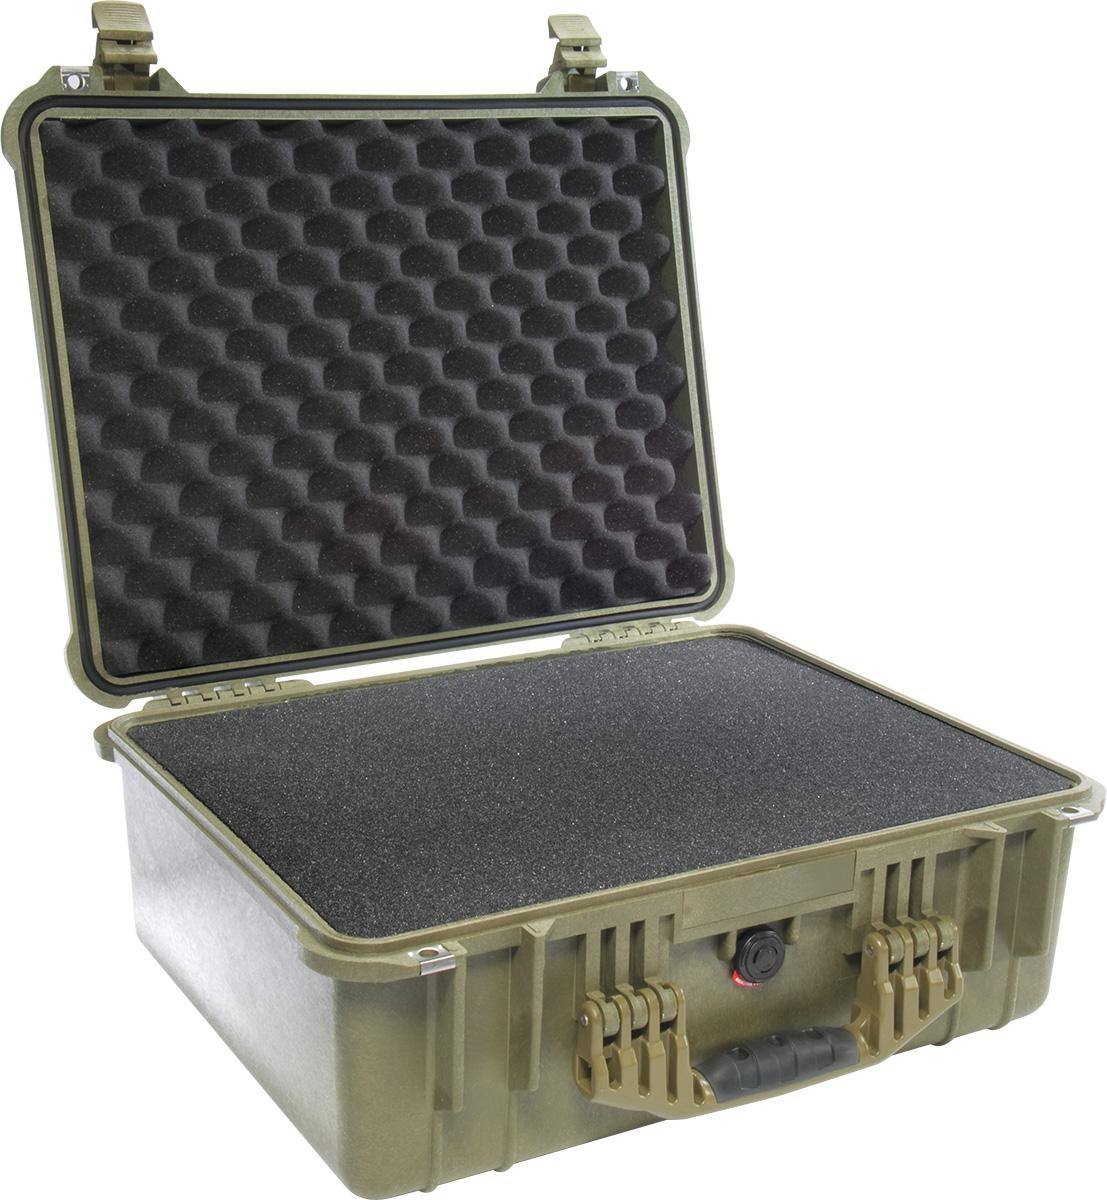 pelican hard shell waterproof tactical case